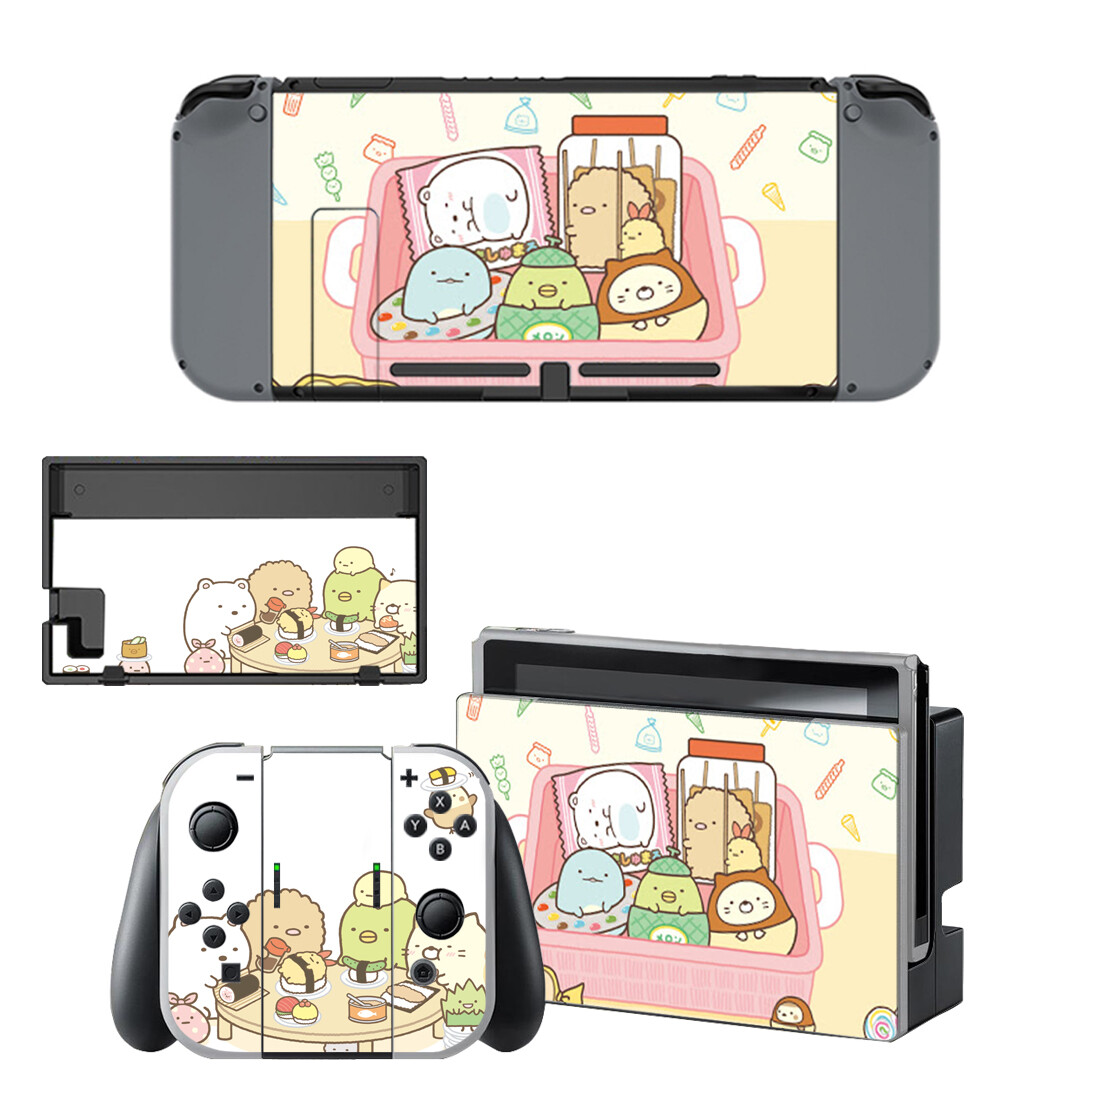 Sumikko Gurashi Nintendo Switch Skin Sticker NintendoSwitch Stickers Skins For Nintend Switch Console And Joy-Con Controller